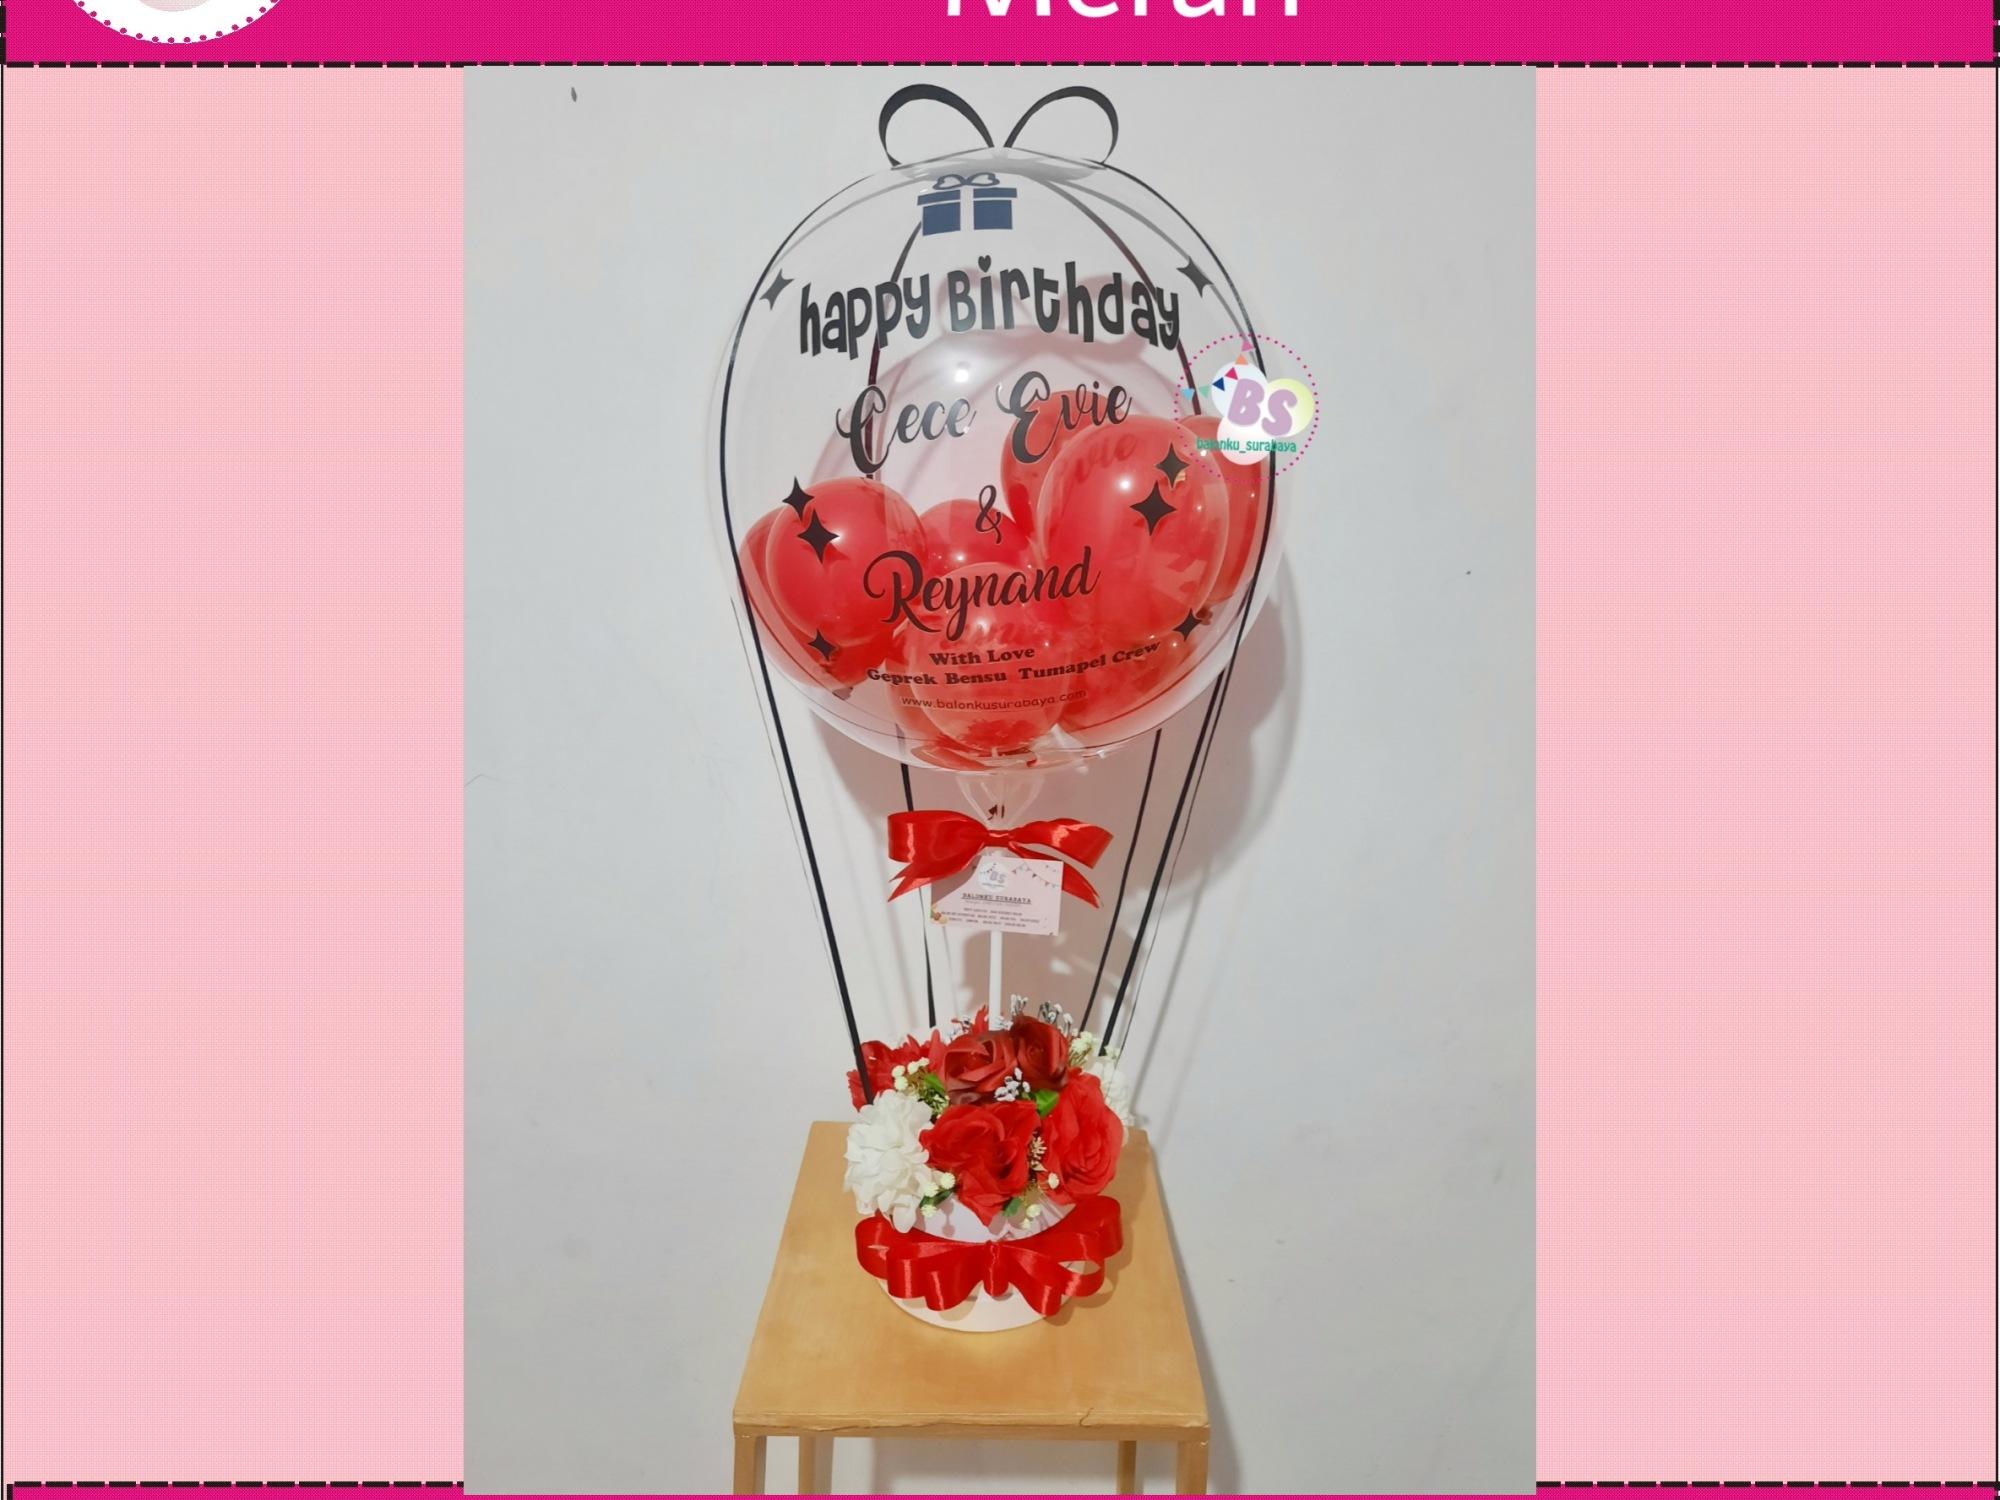 balon ucapan ulang tahun warna merah, balon ucapan ulang tahun merah, balon ucapan ulang tahun anak balon ucapan warna peach, baln ucapan box coklat, jual balon latex twist hijau emerald, BAlon Gas,Bunga dekorasi,Rangkaian bunga artificial, Buket bunga, buket bunga mawar, harga buket bunga,Balon sablon, balon Printing, balon promosi, Perlengkapan ulang tahun, Balon latex , balon doff, balon natal, balon agustusan, balon dekorasi, balonku Surabaya, 085733133529